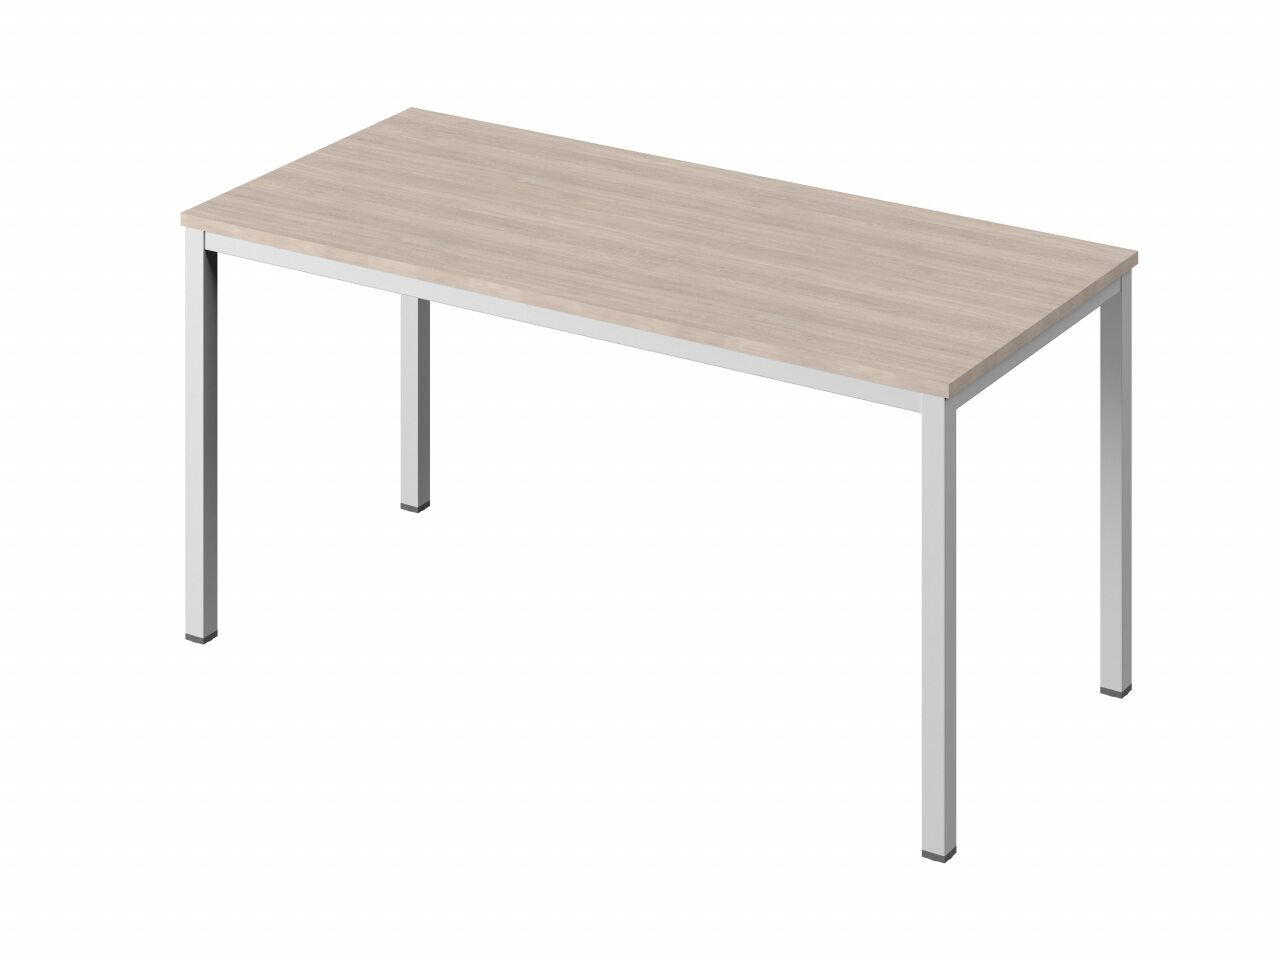 Стол на металлокаркасе без заглушек кабель-канала - фото 5